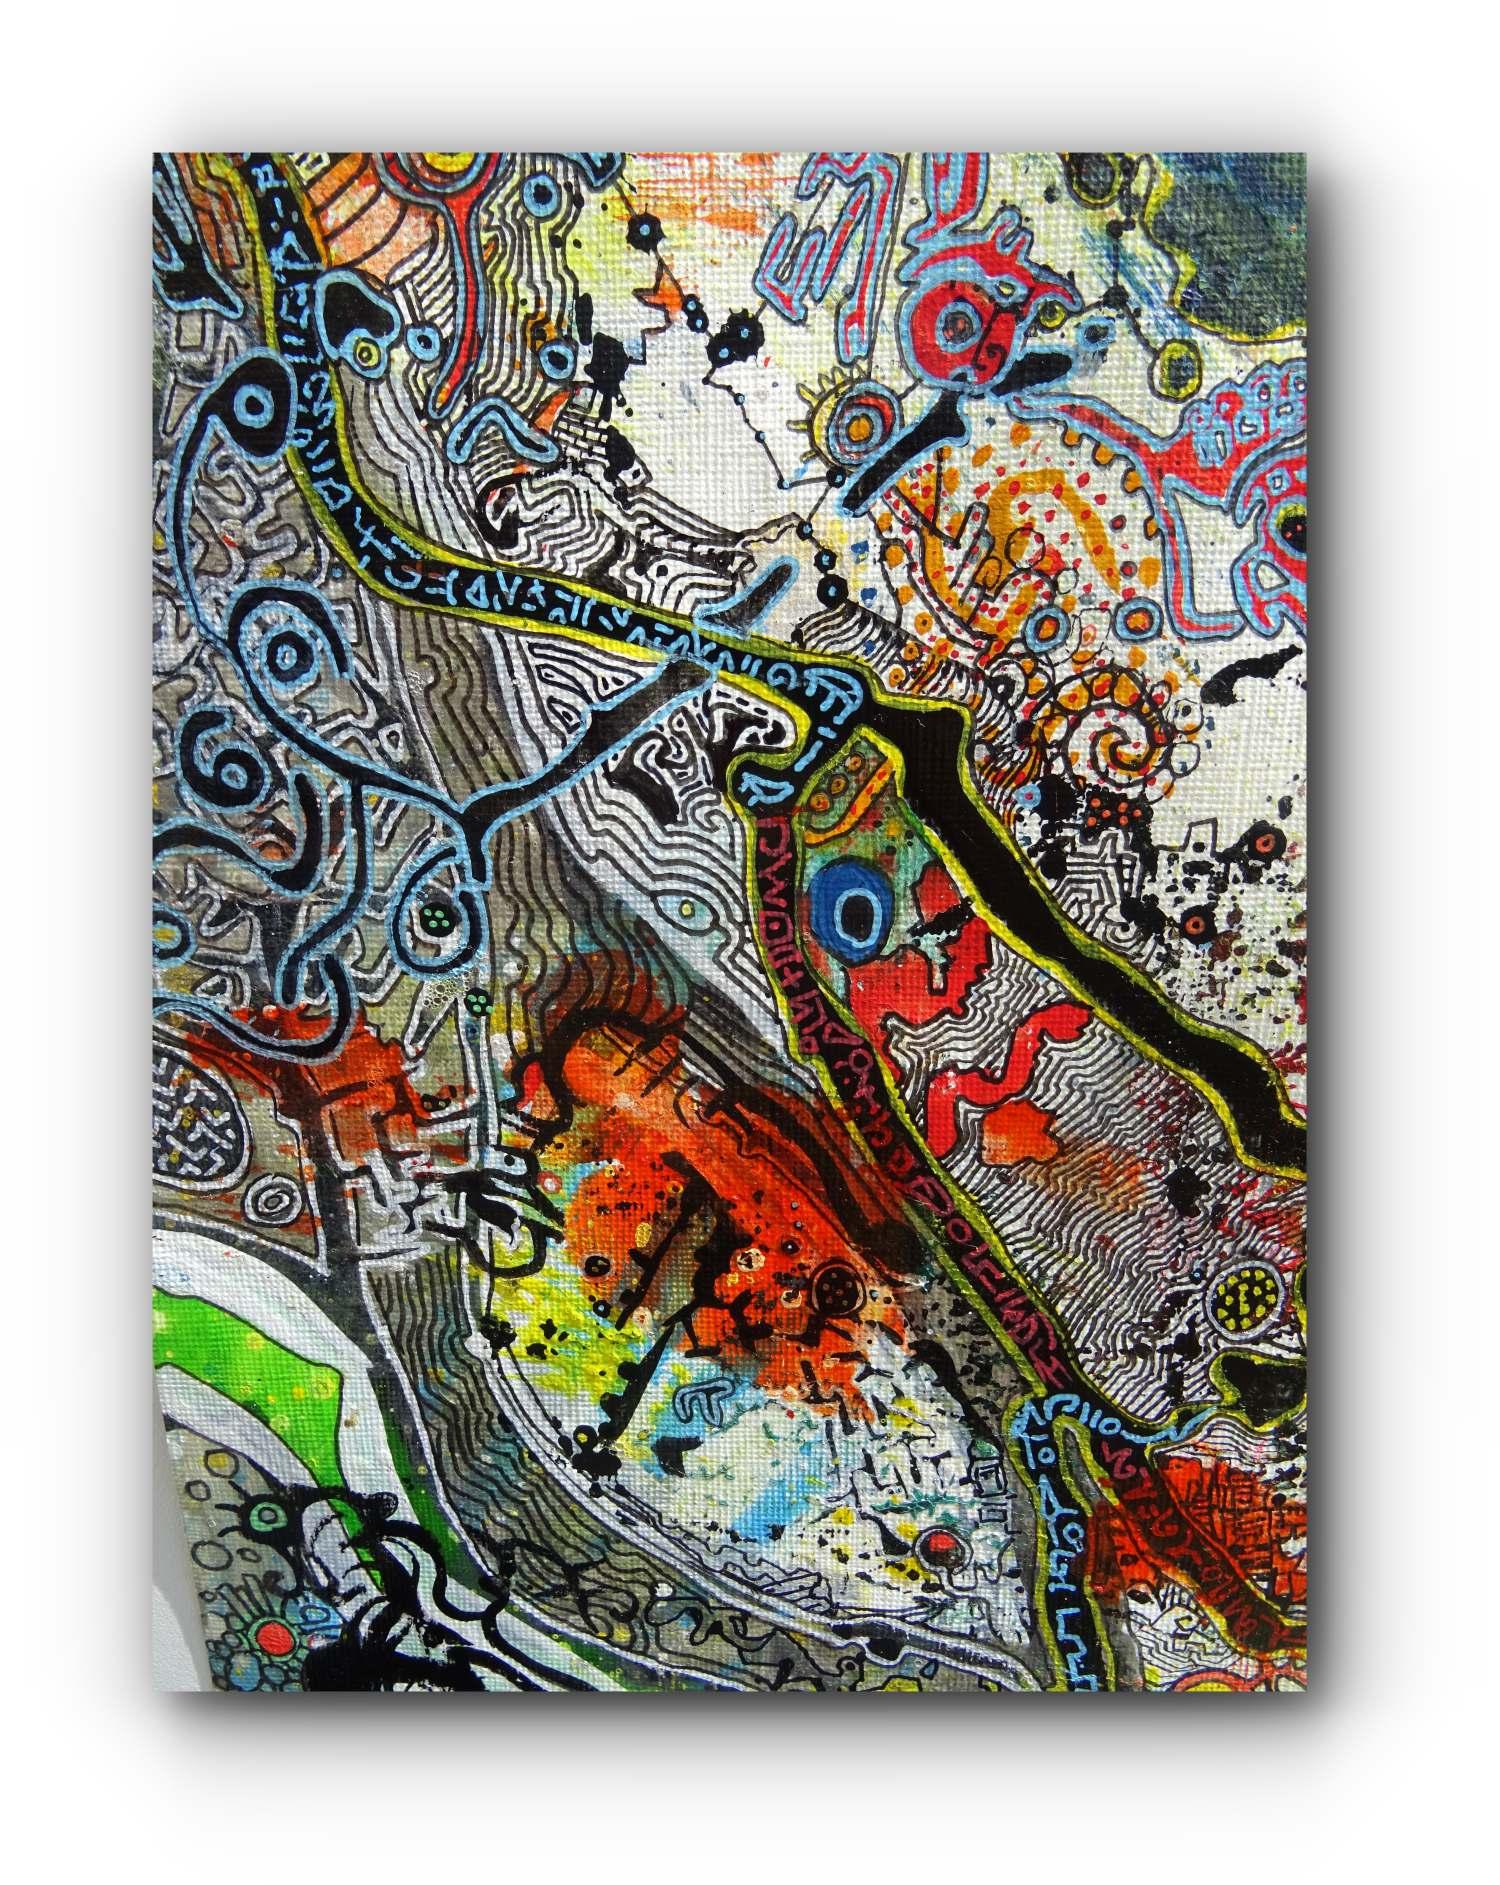 painting-detail-5-ground-control-artists-ingress-vortices.jpg